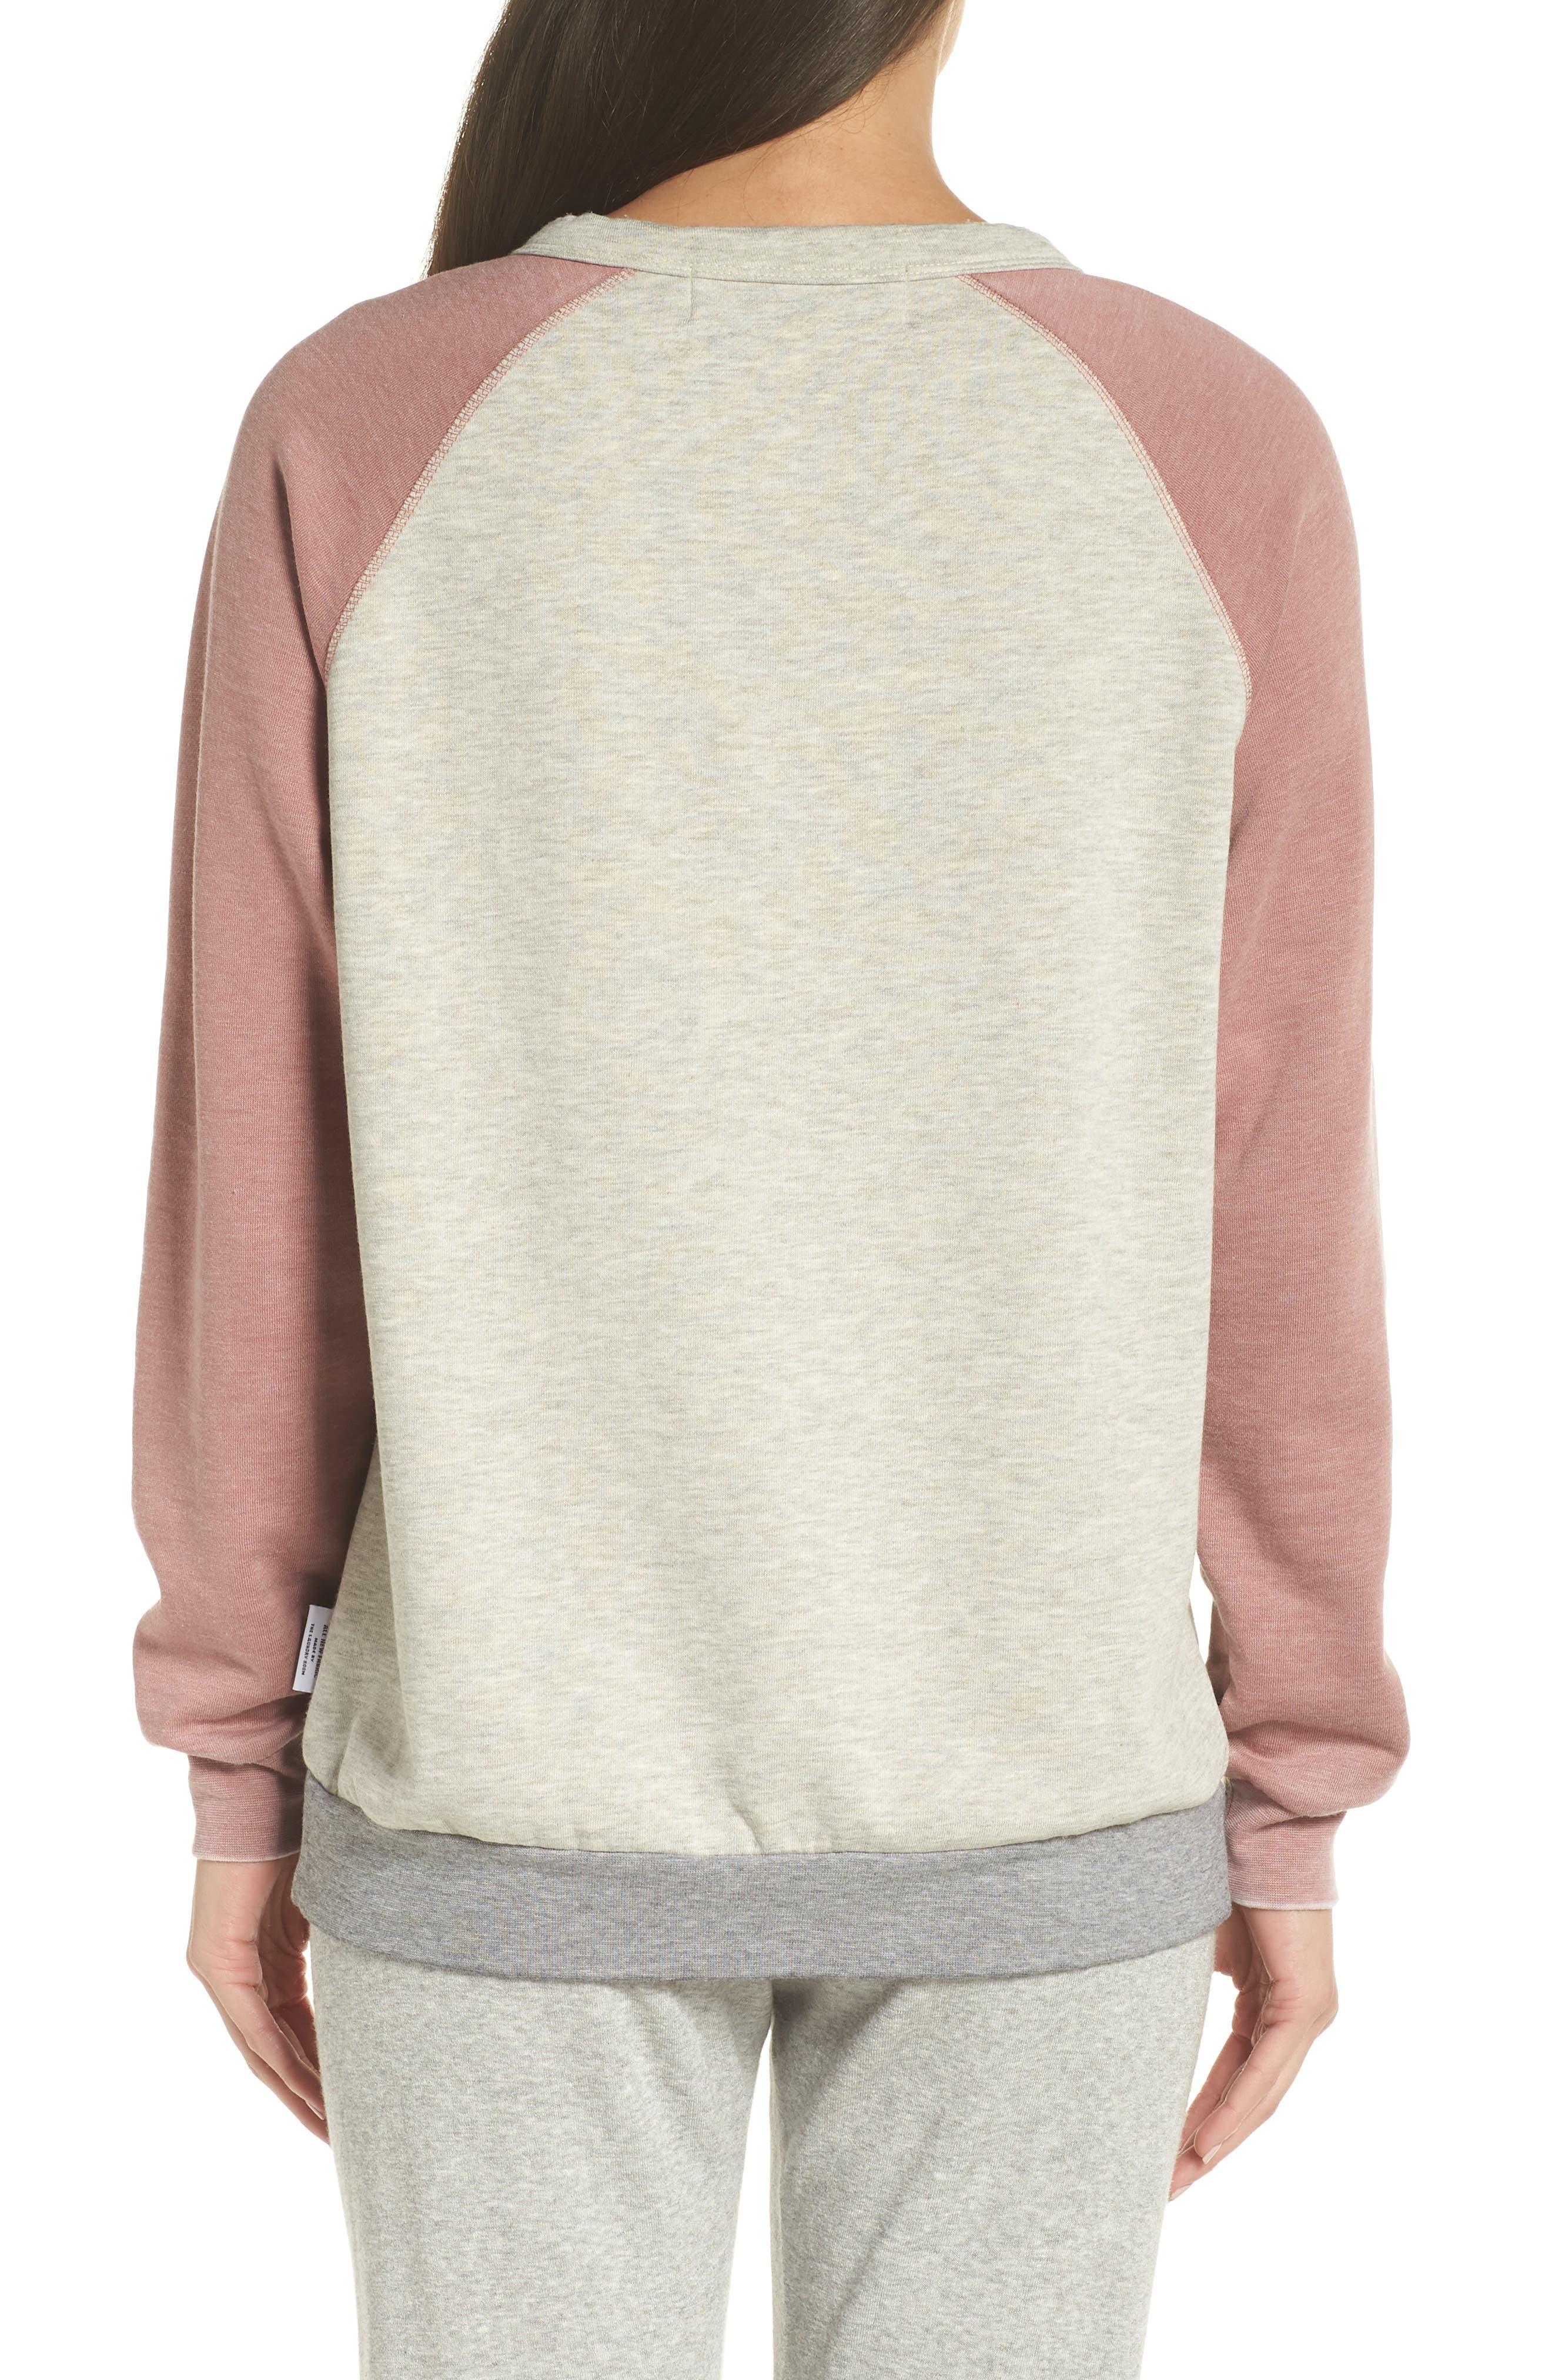 Sweatshirt,                             Alternate thumbnail 2, color,                             PEBBLE HEATHER / MAUVE